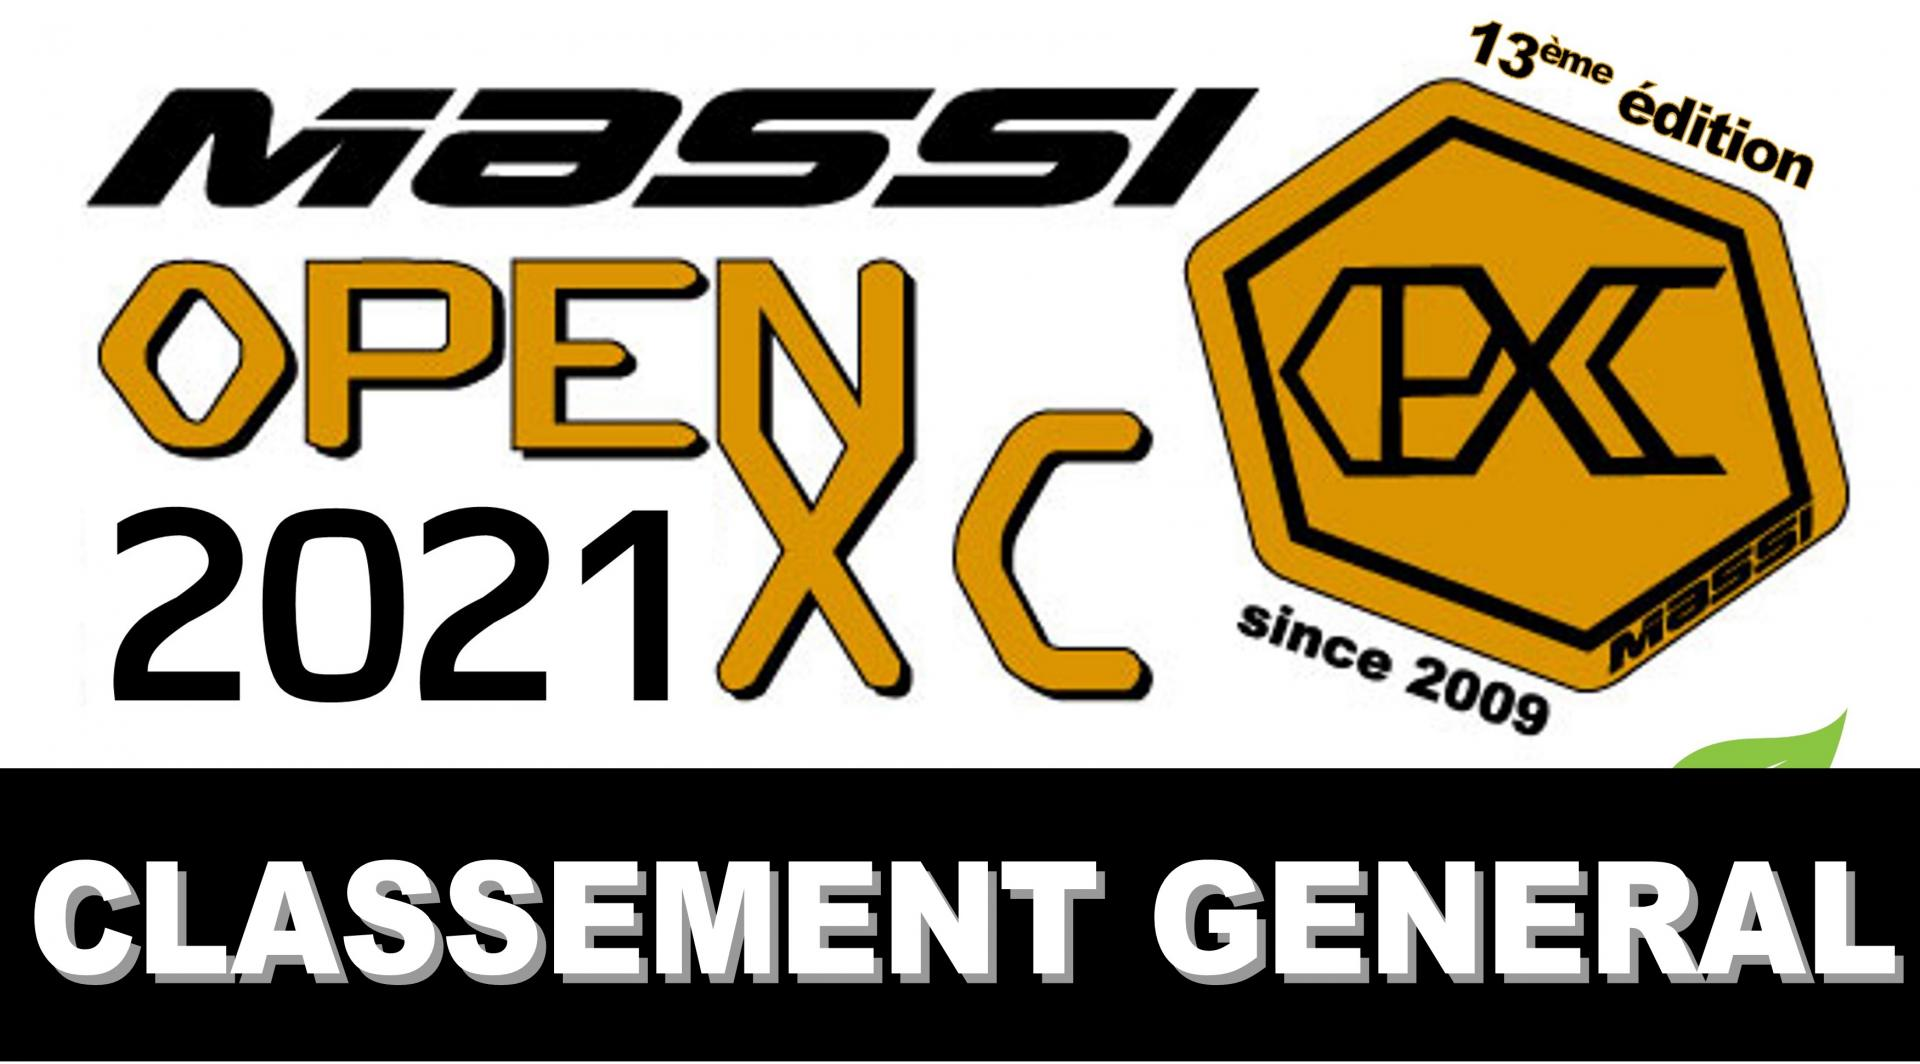 CLASSEMENT GENERAL 2021